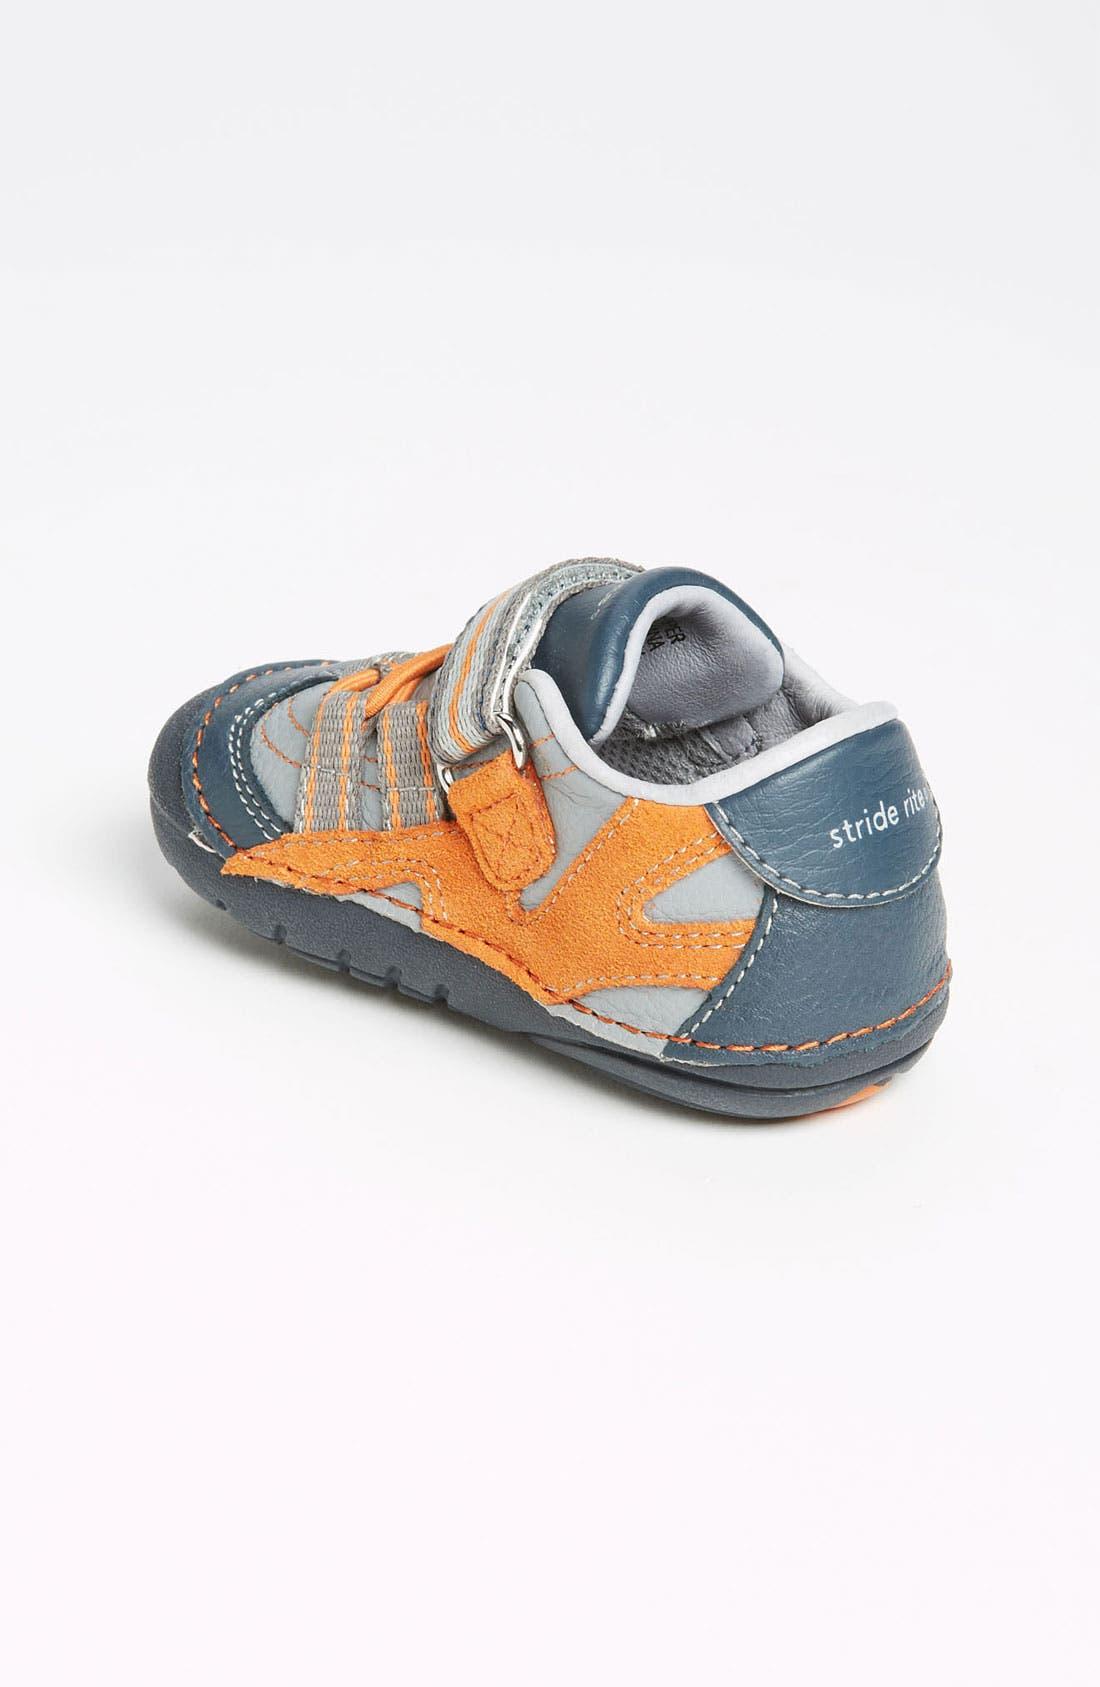 Alternate Image 2  - Stride Rite 'Leo' Sneaker (Baby & Walker)